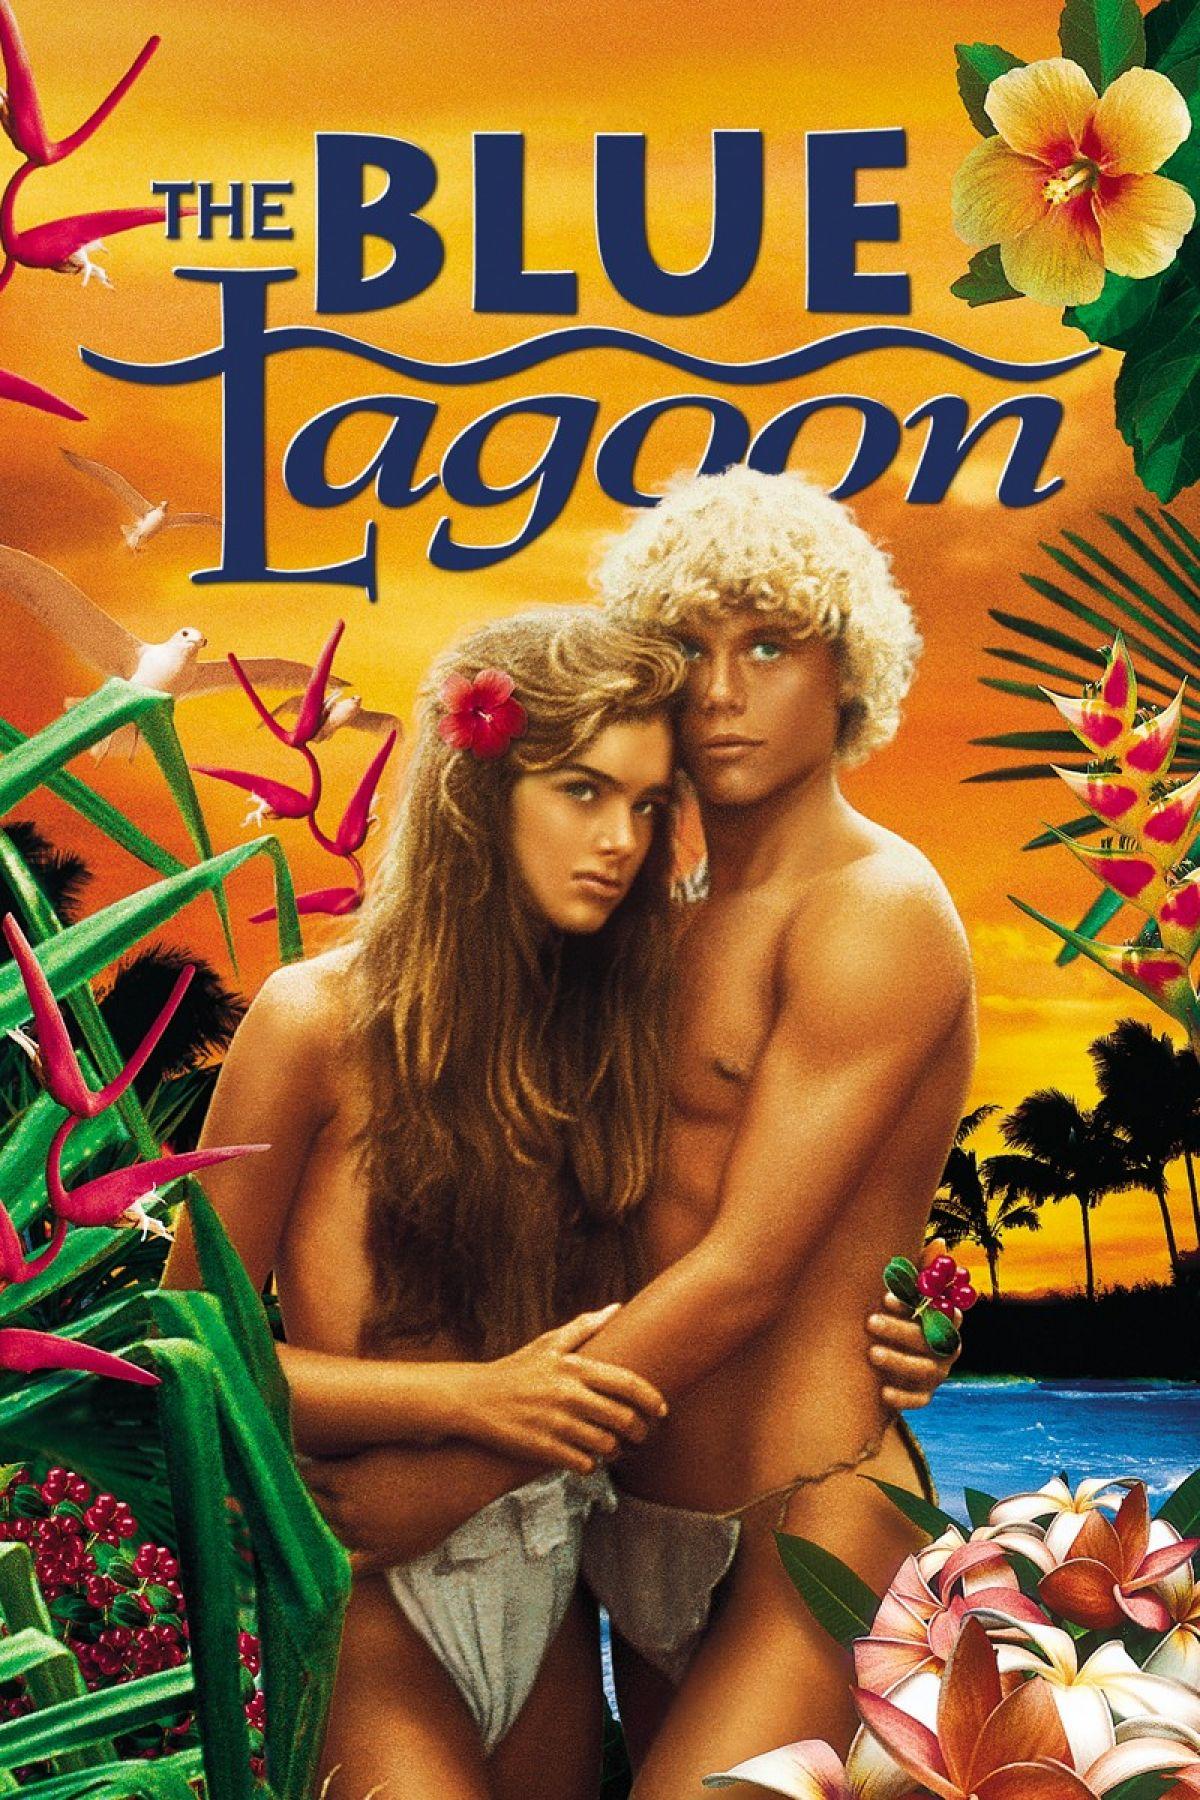 24076_the_blue_lagoon_poster_artwork_christopher_atkins_brooke_shields_william_daniels.jpg